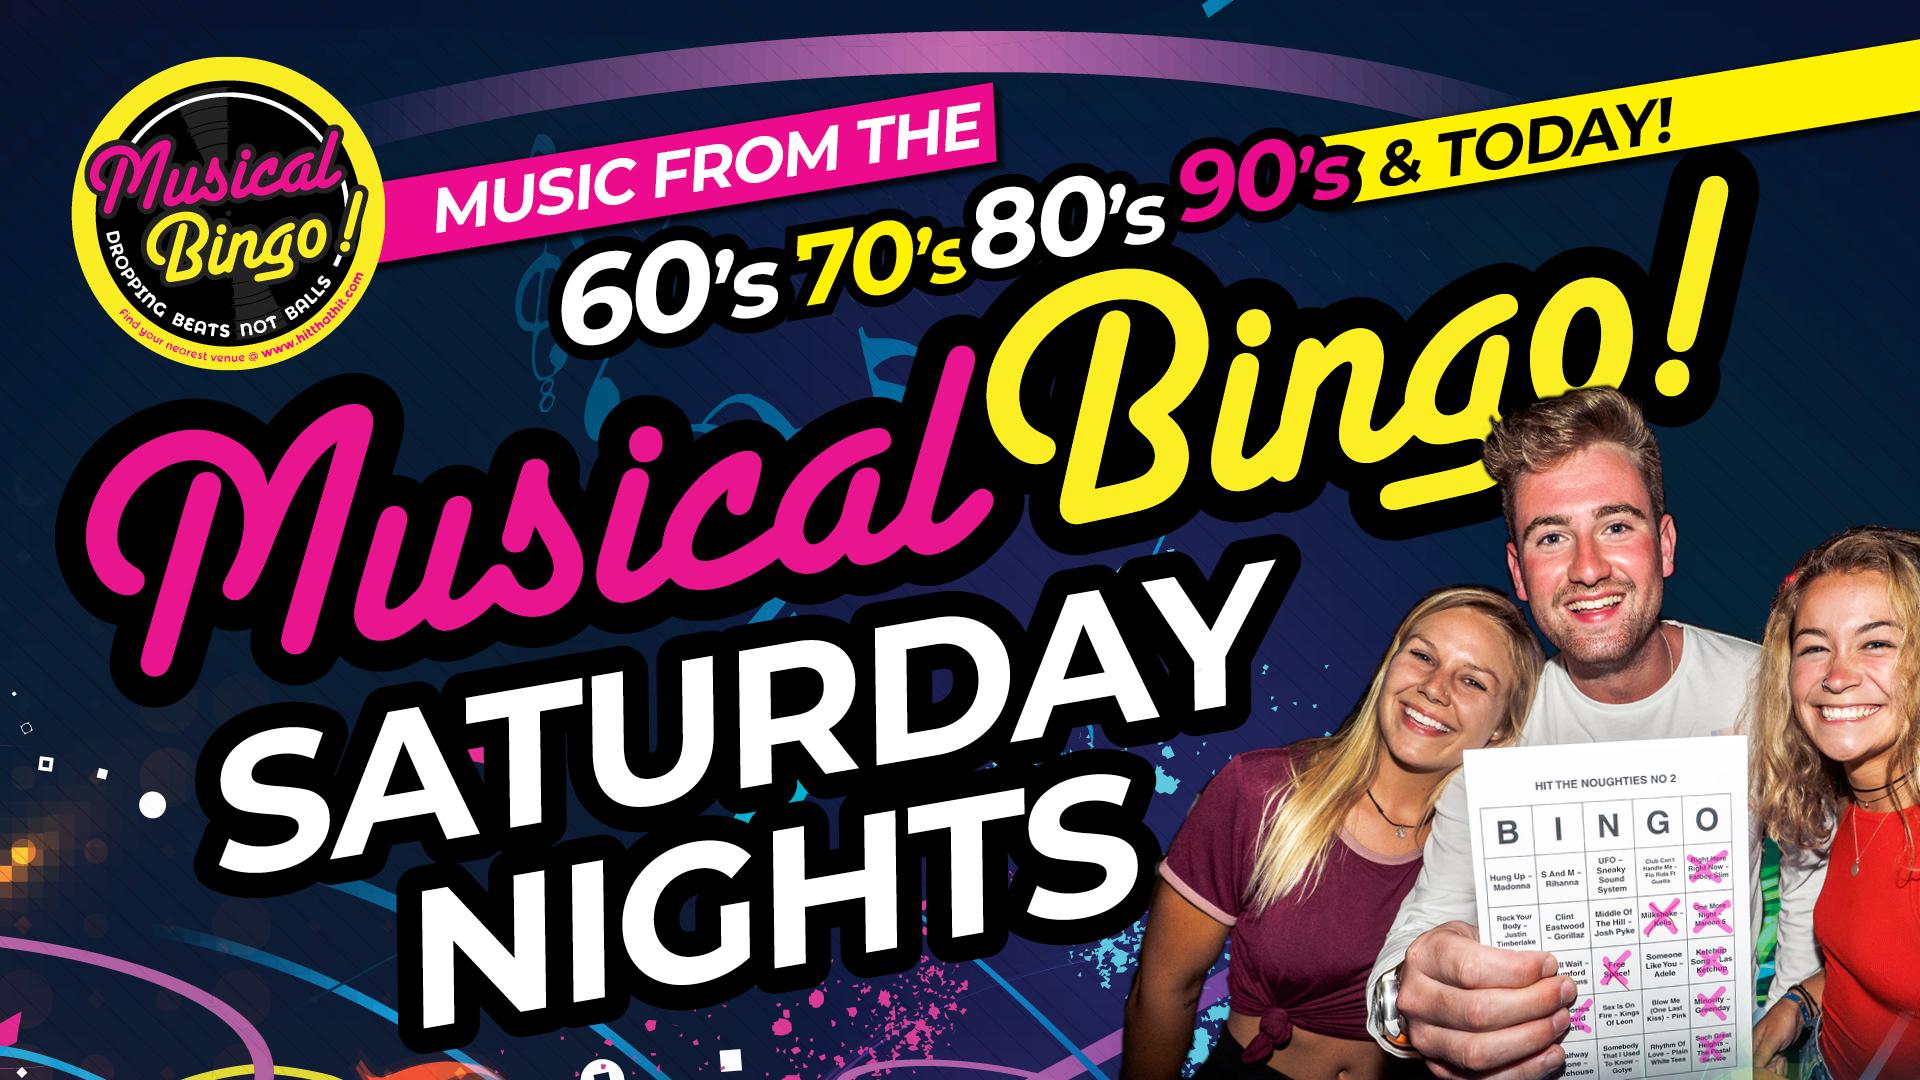 Musical Bingo Nightlife Graphic - Saturday.jpg